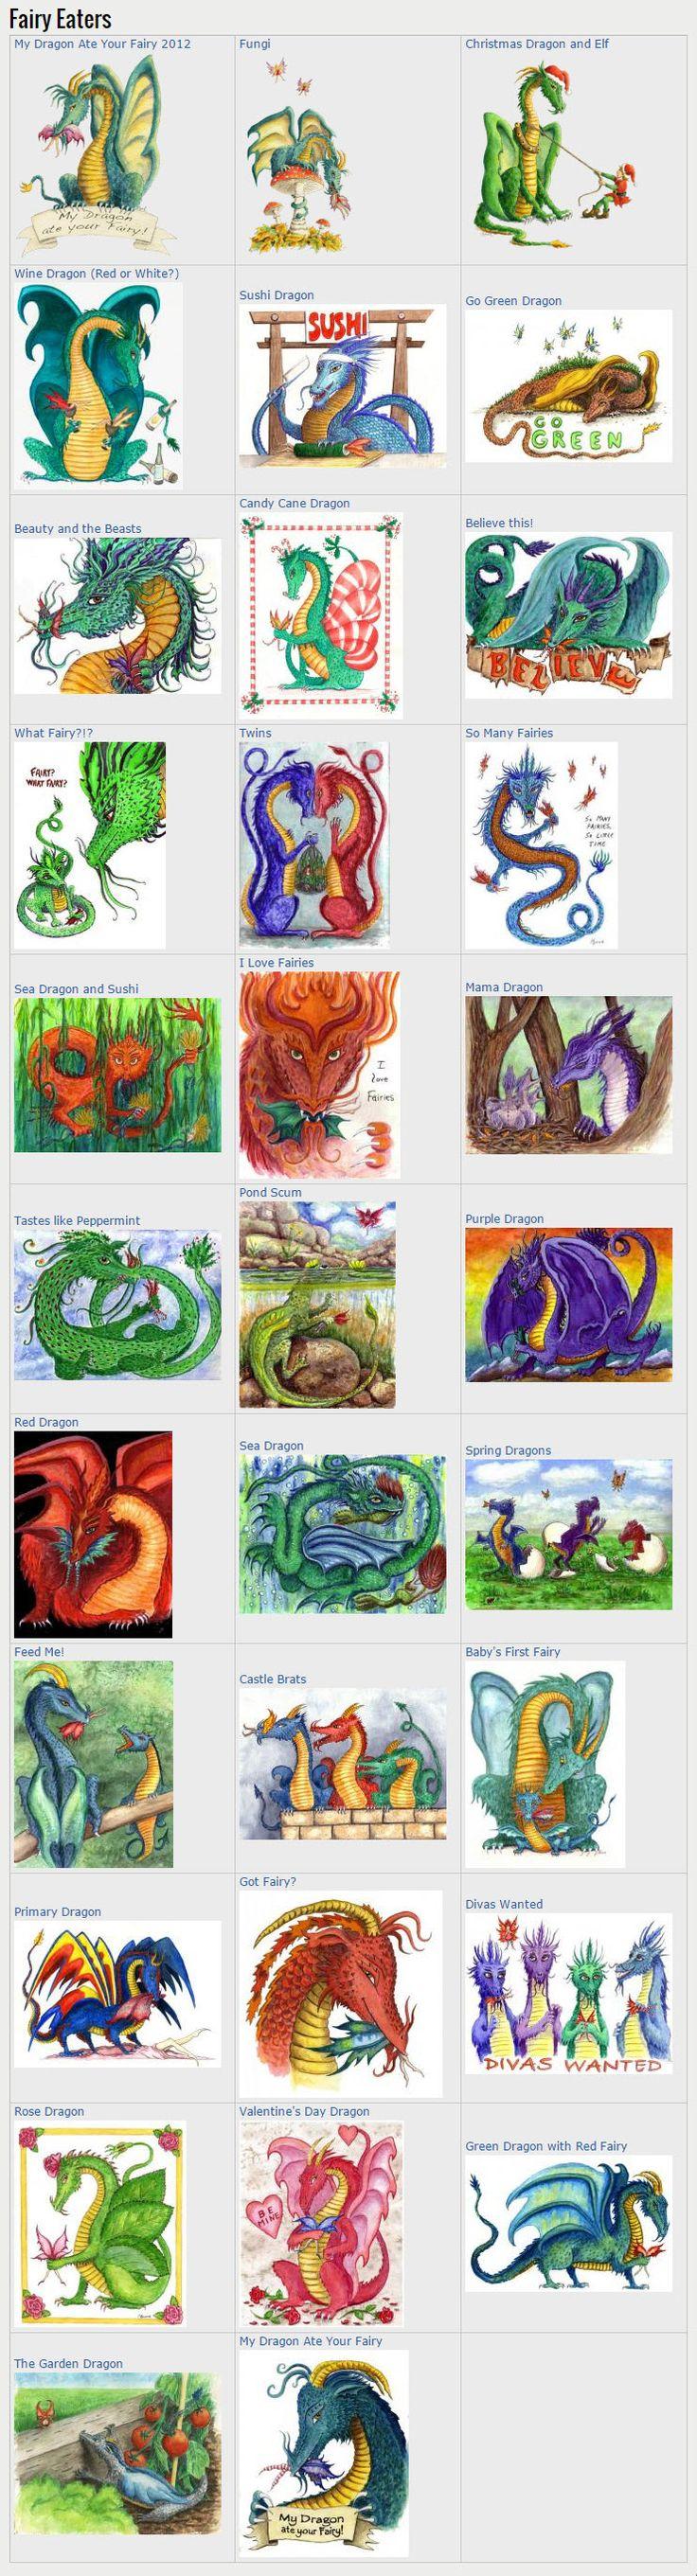 131 best Dragons Long images on Pinterest